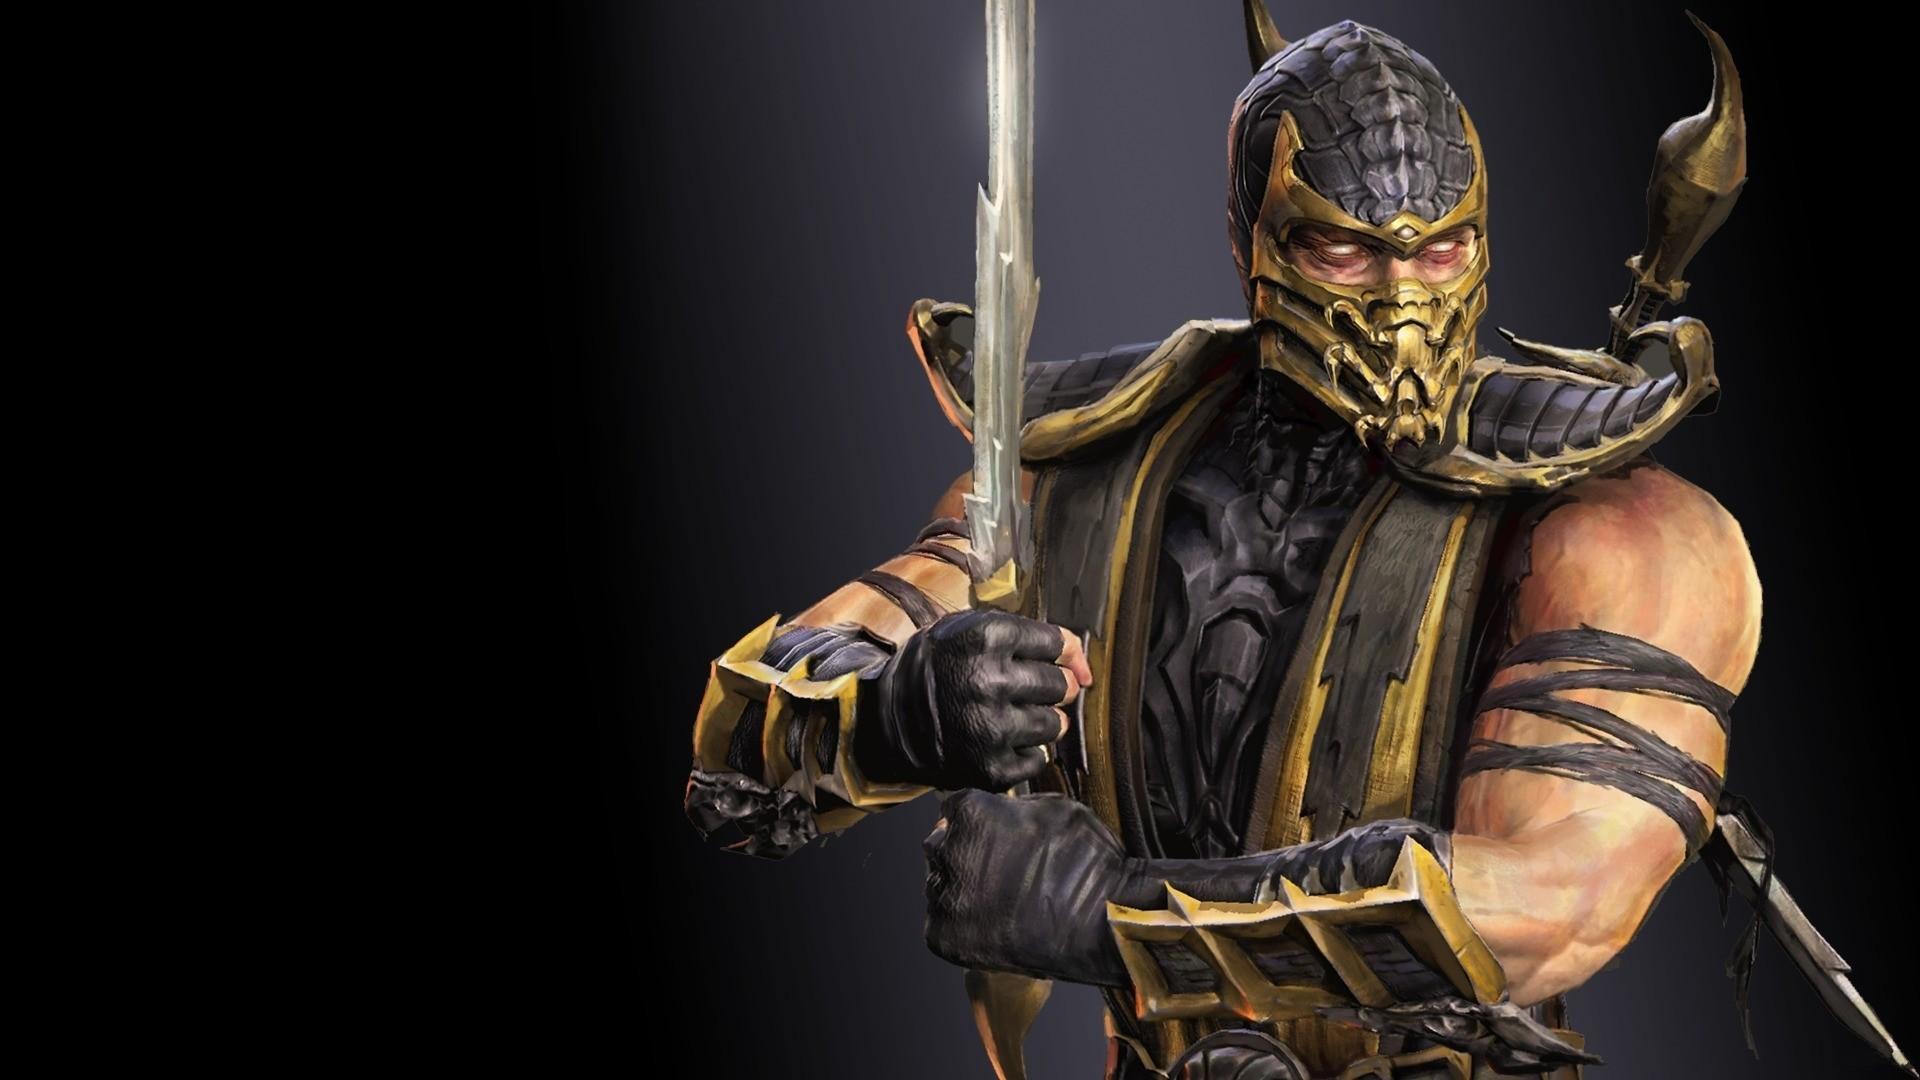 Scorpion Mortal Kombat Wallpaper 32727